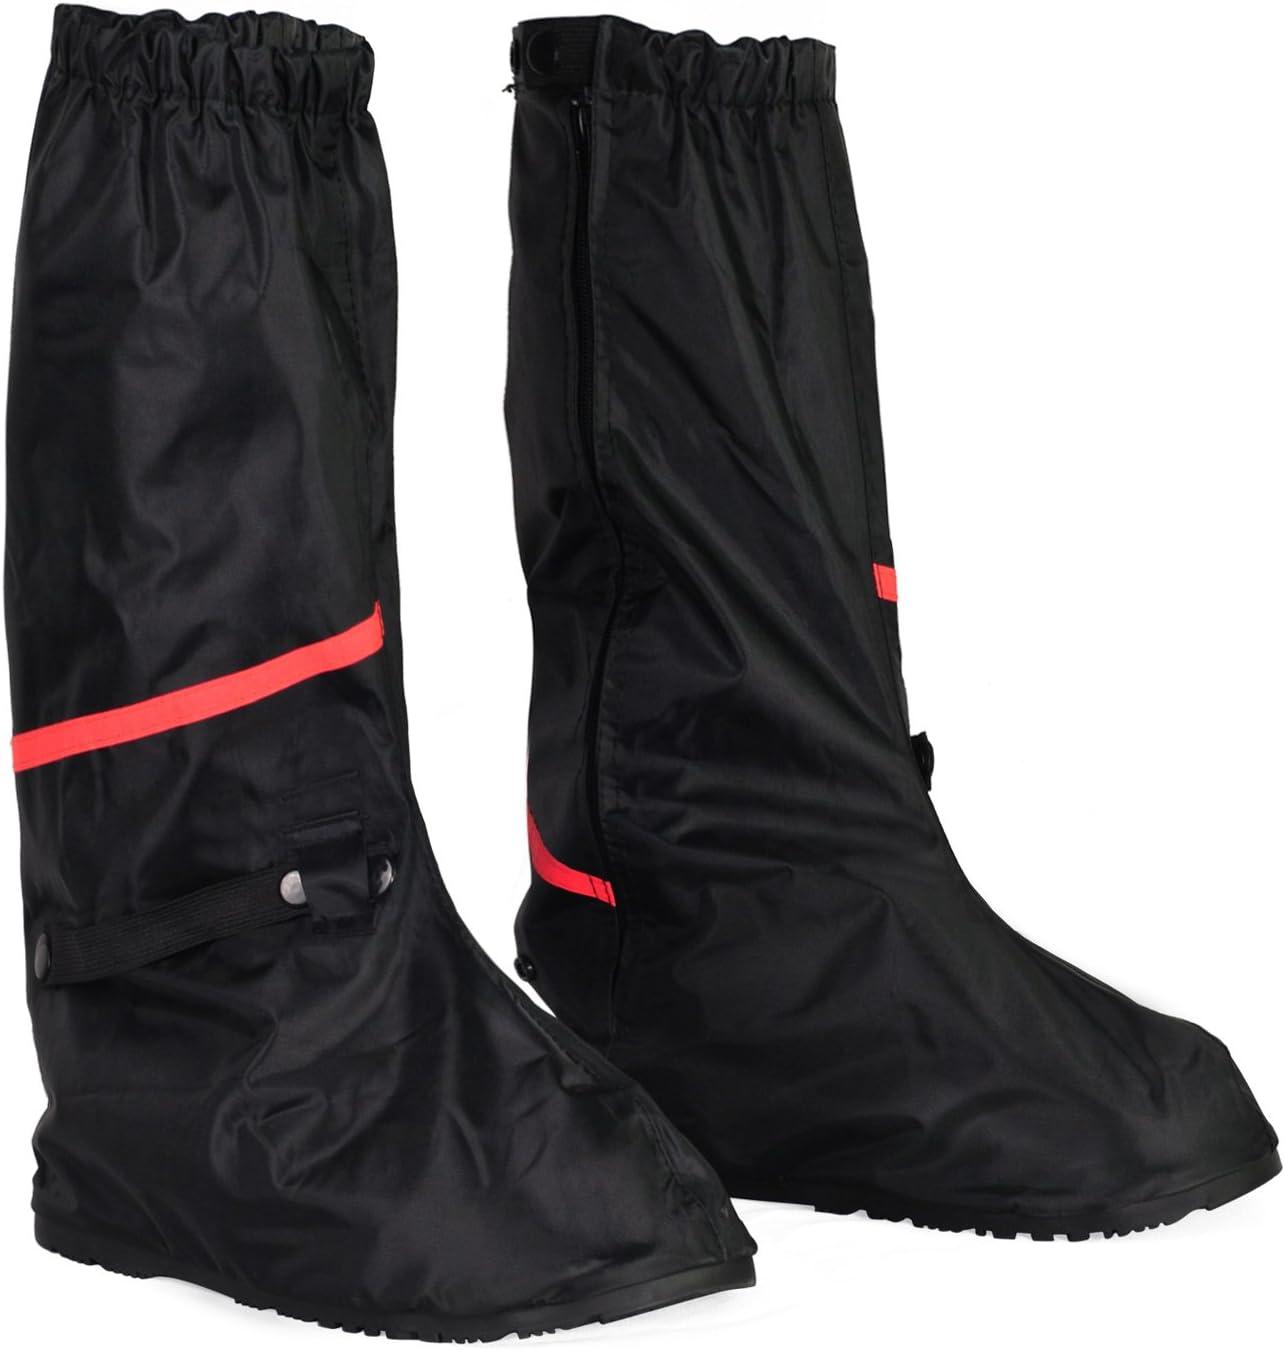 HSEAMALL Zapatos a Prueba de Agua